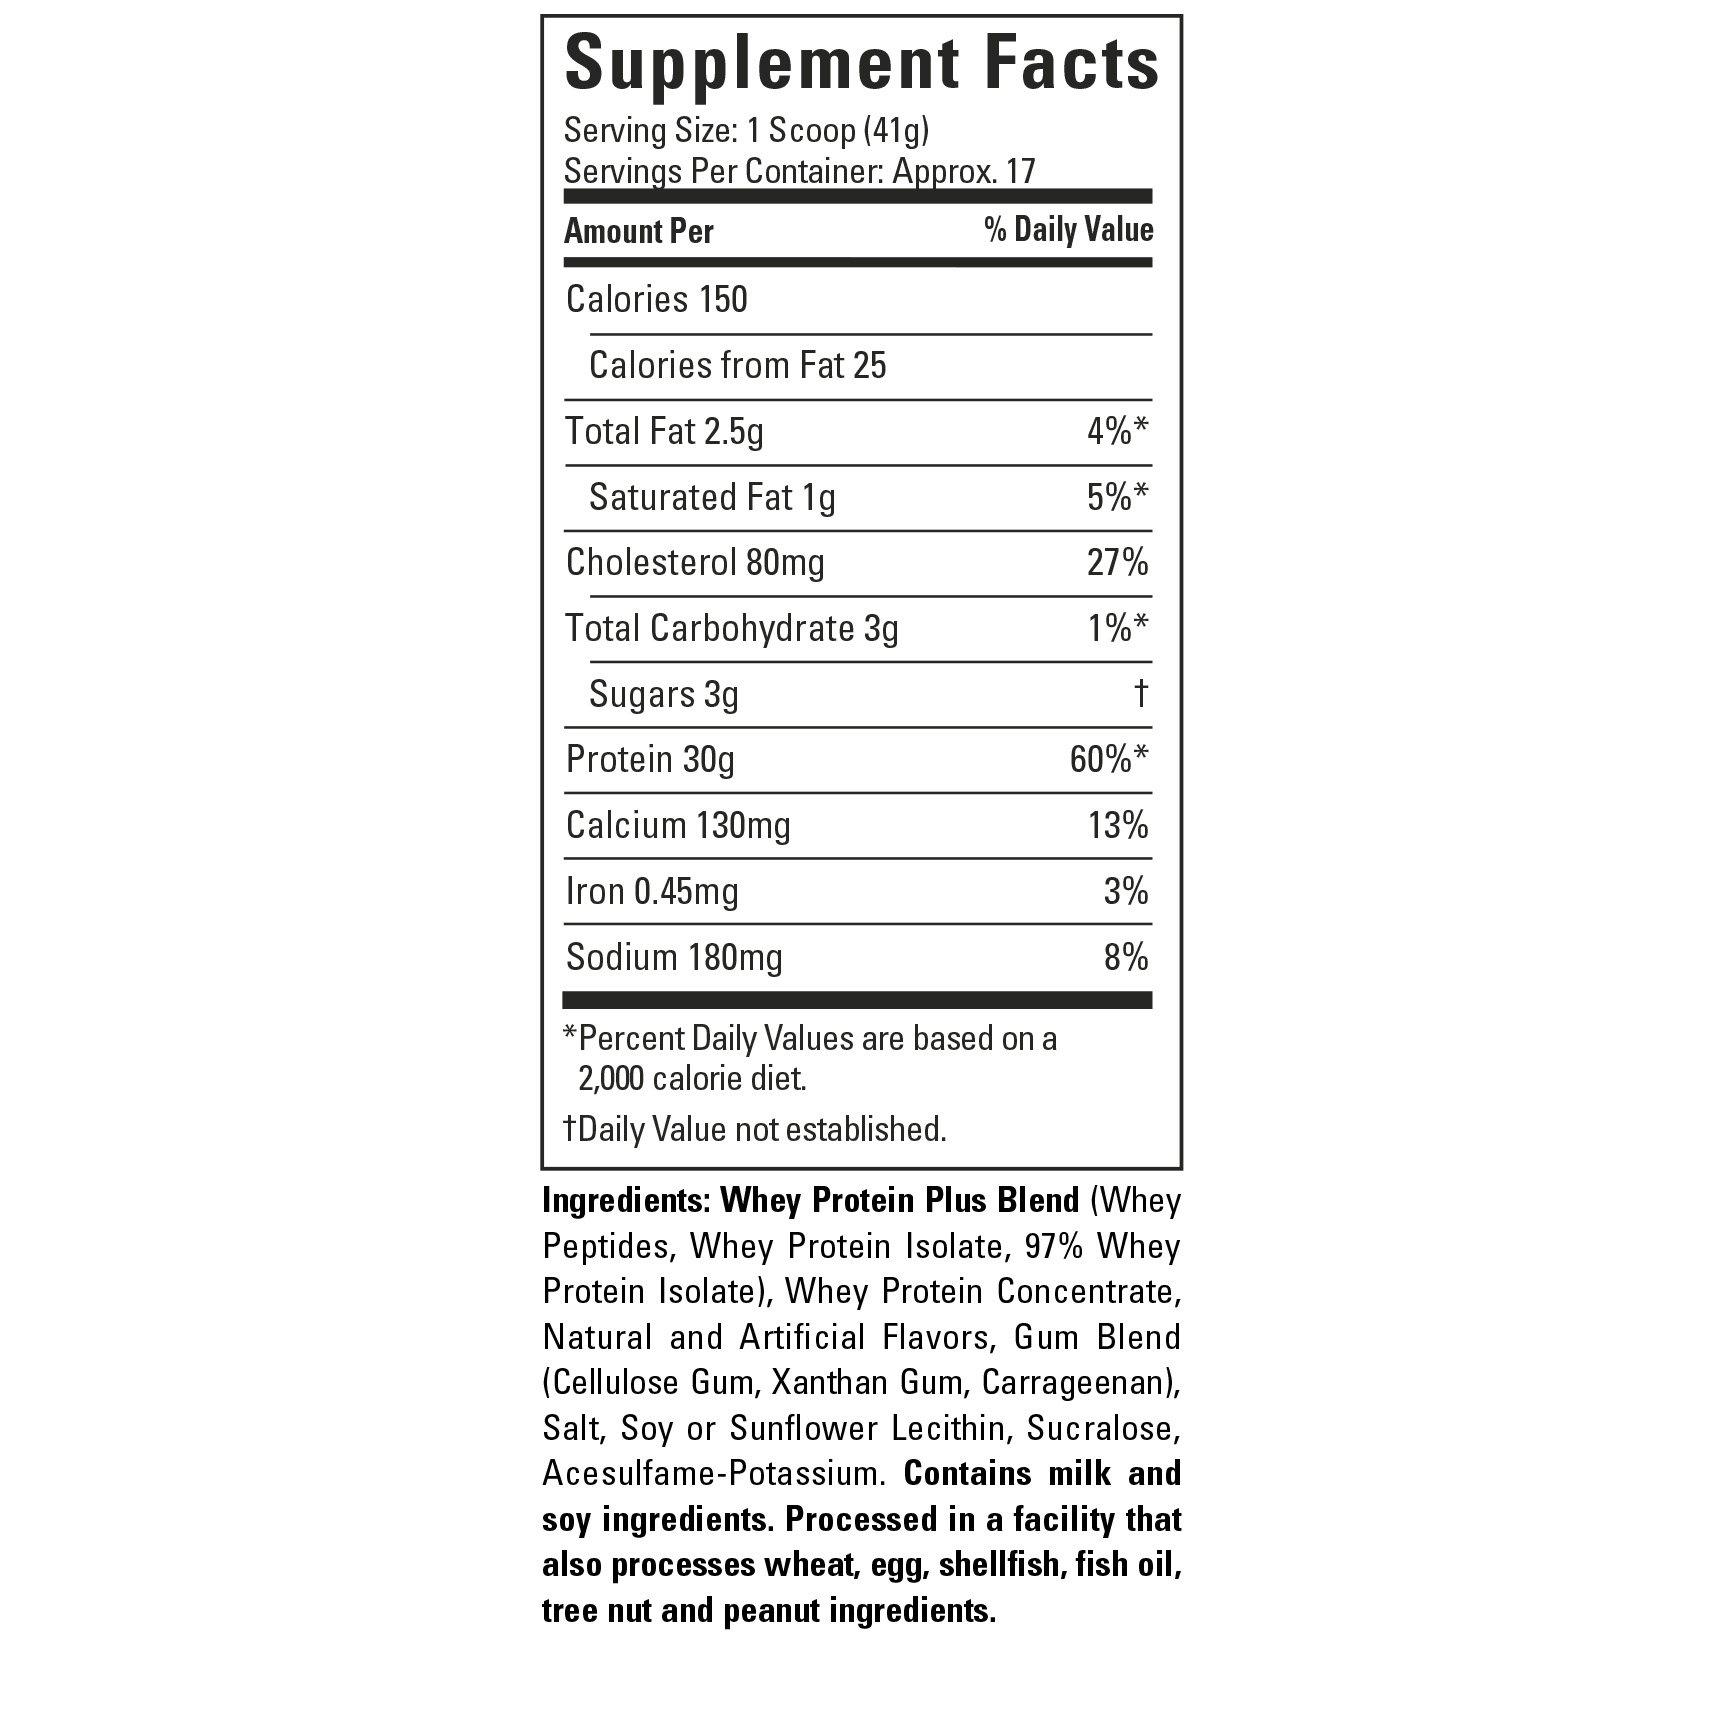 Six Star Whey Isolate Plus Protein Powder, 100% Whey Protein Isolate,Vanilla Cream,1.5 Pounds